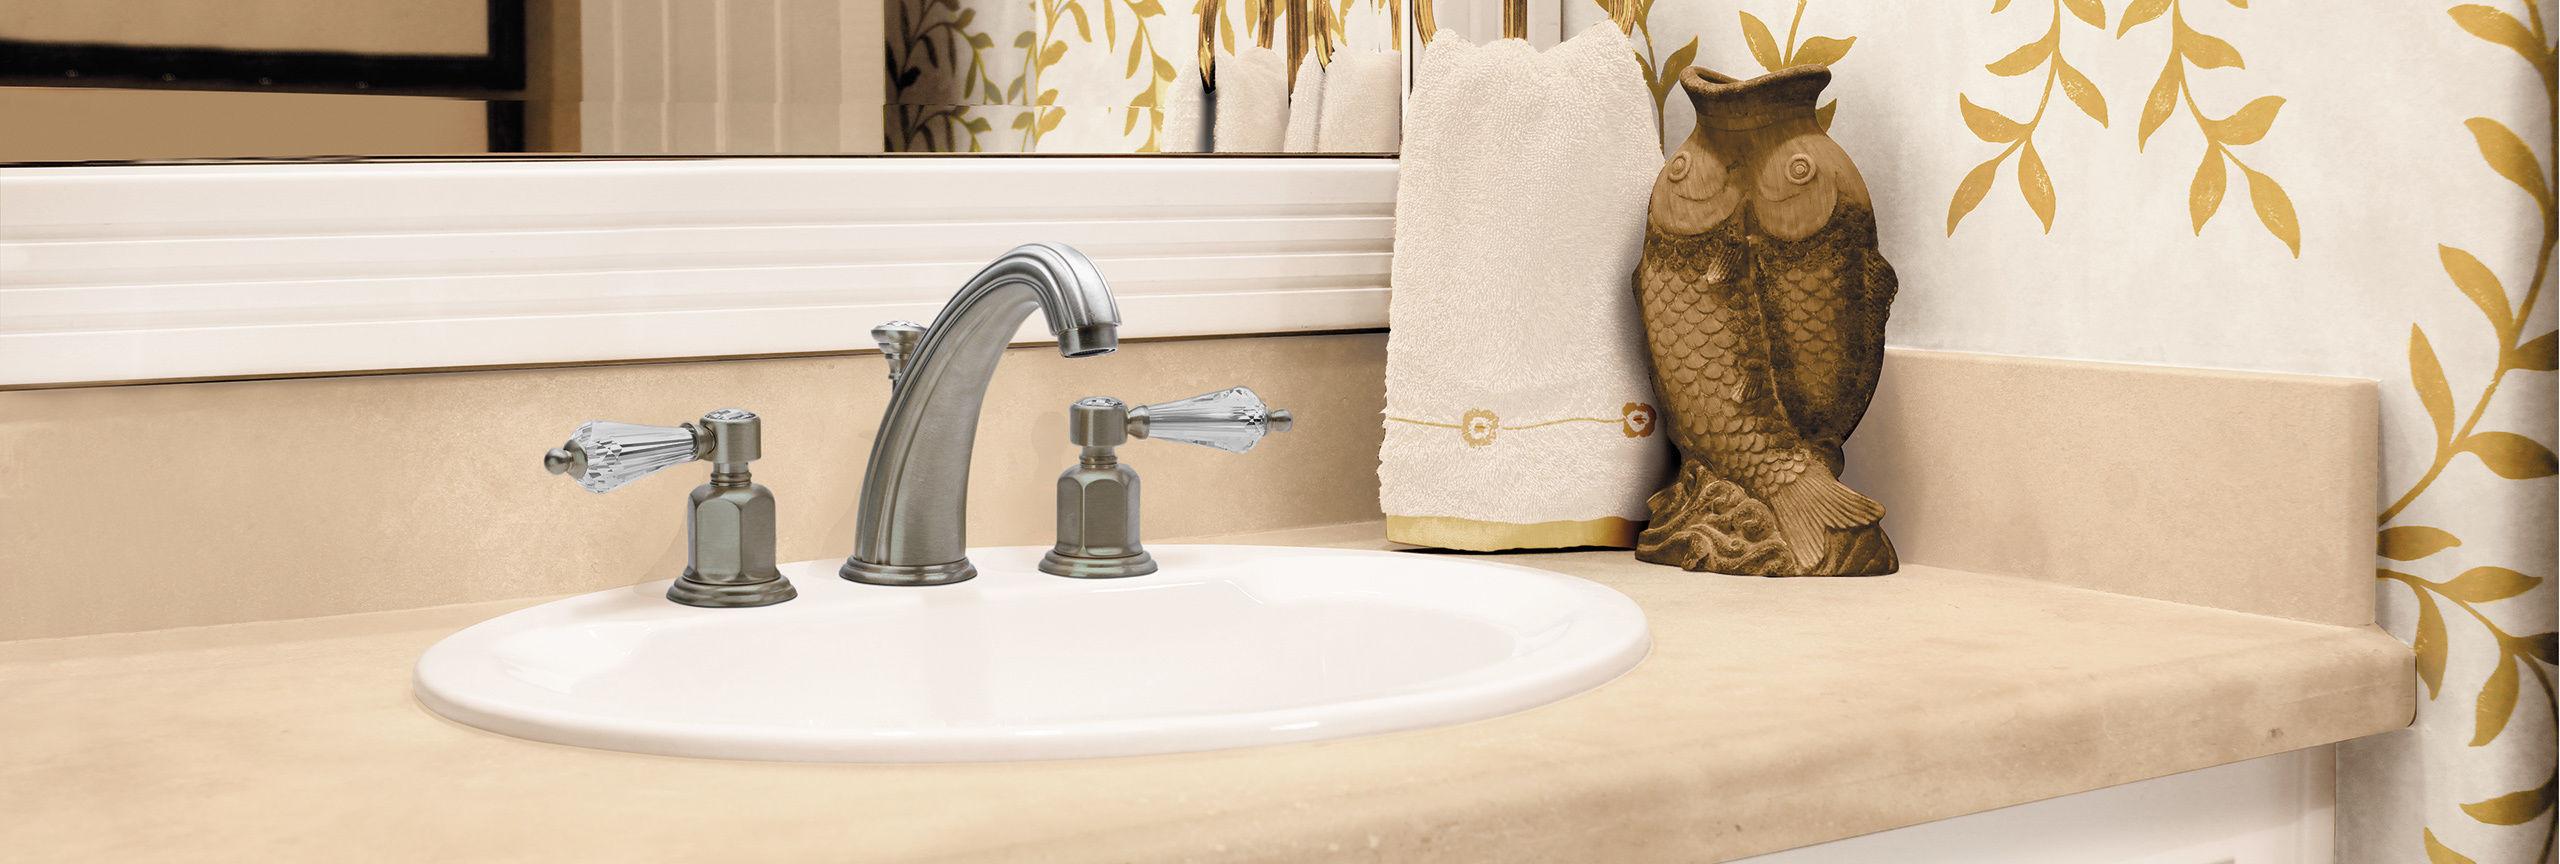 bathroom series: san clemente widespread faucet with crystal handles